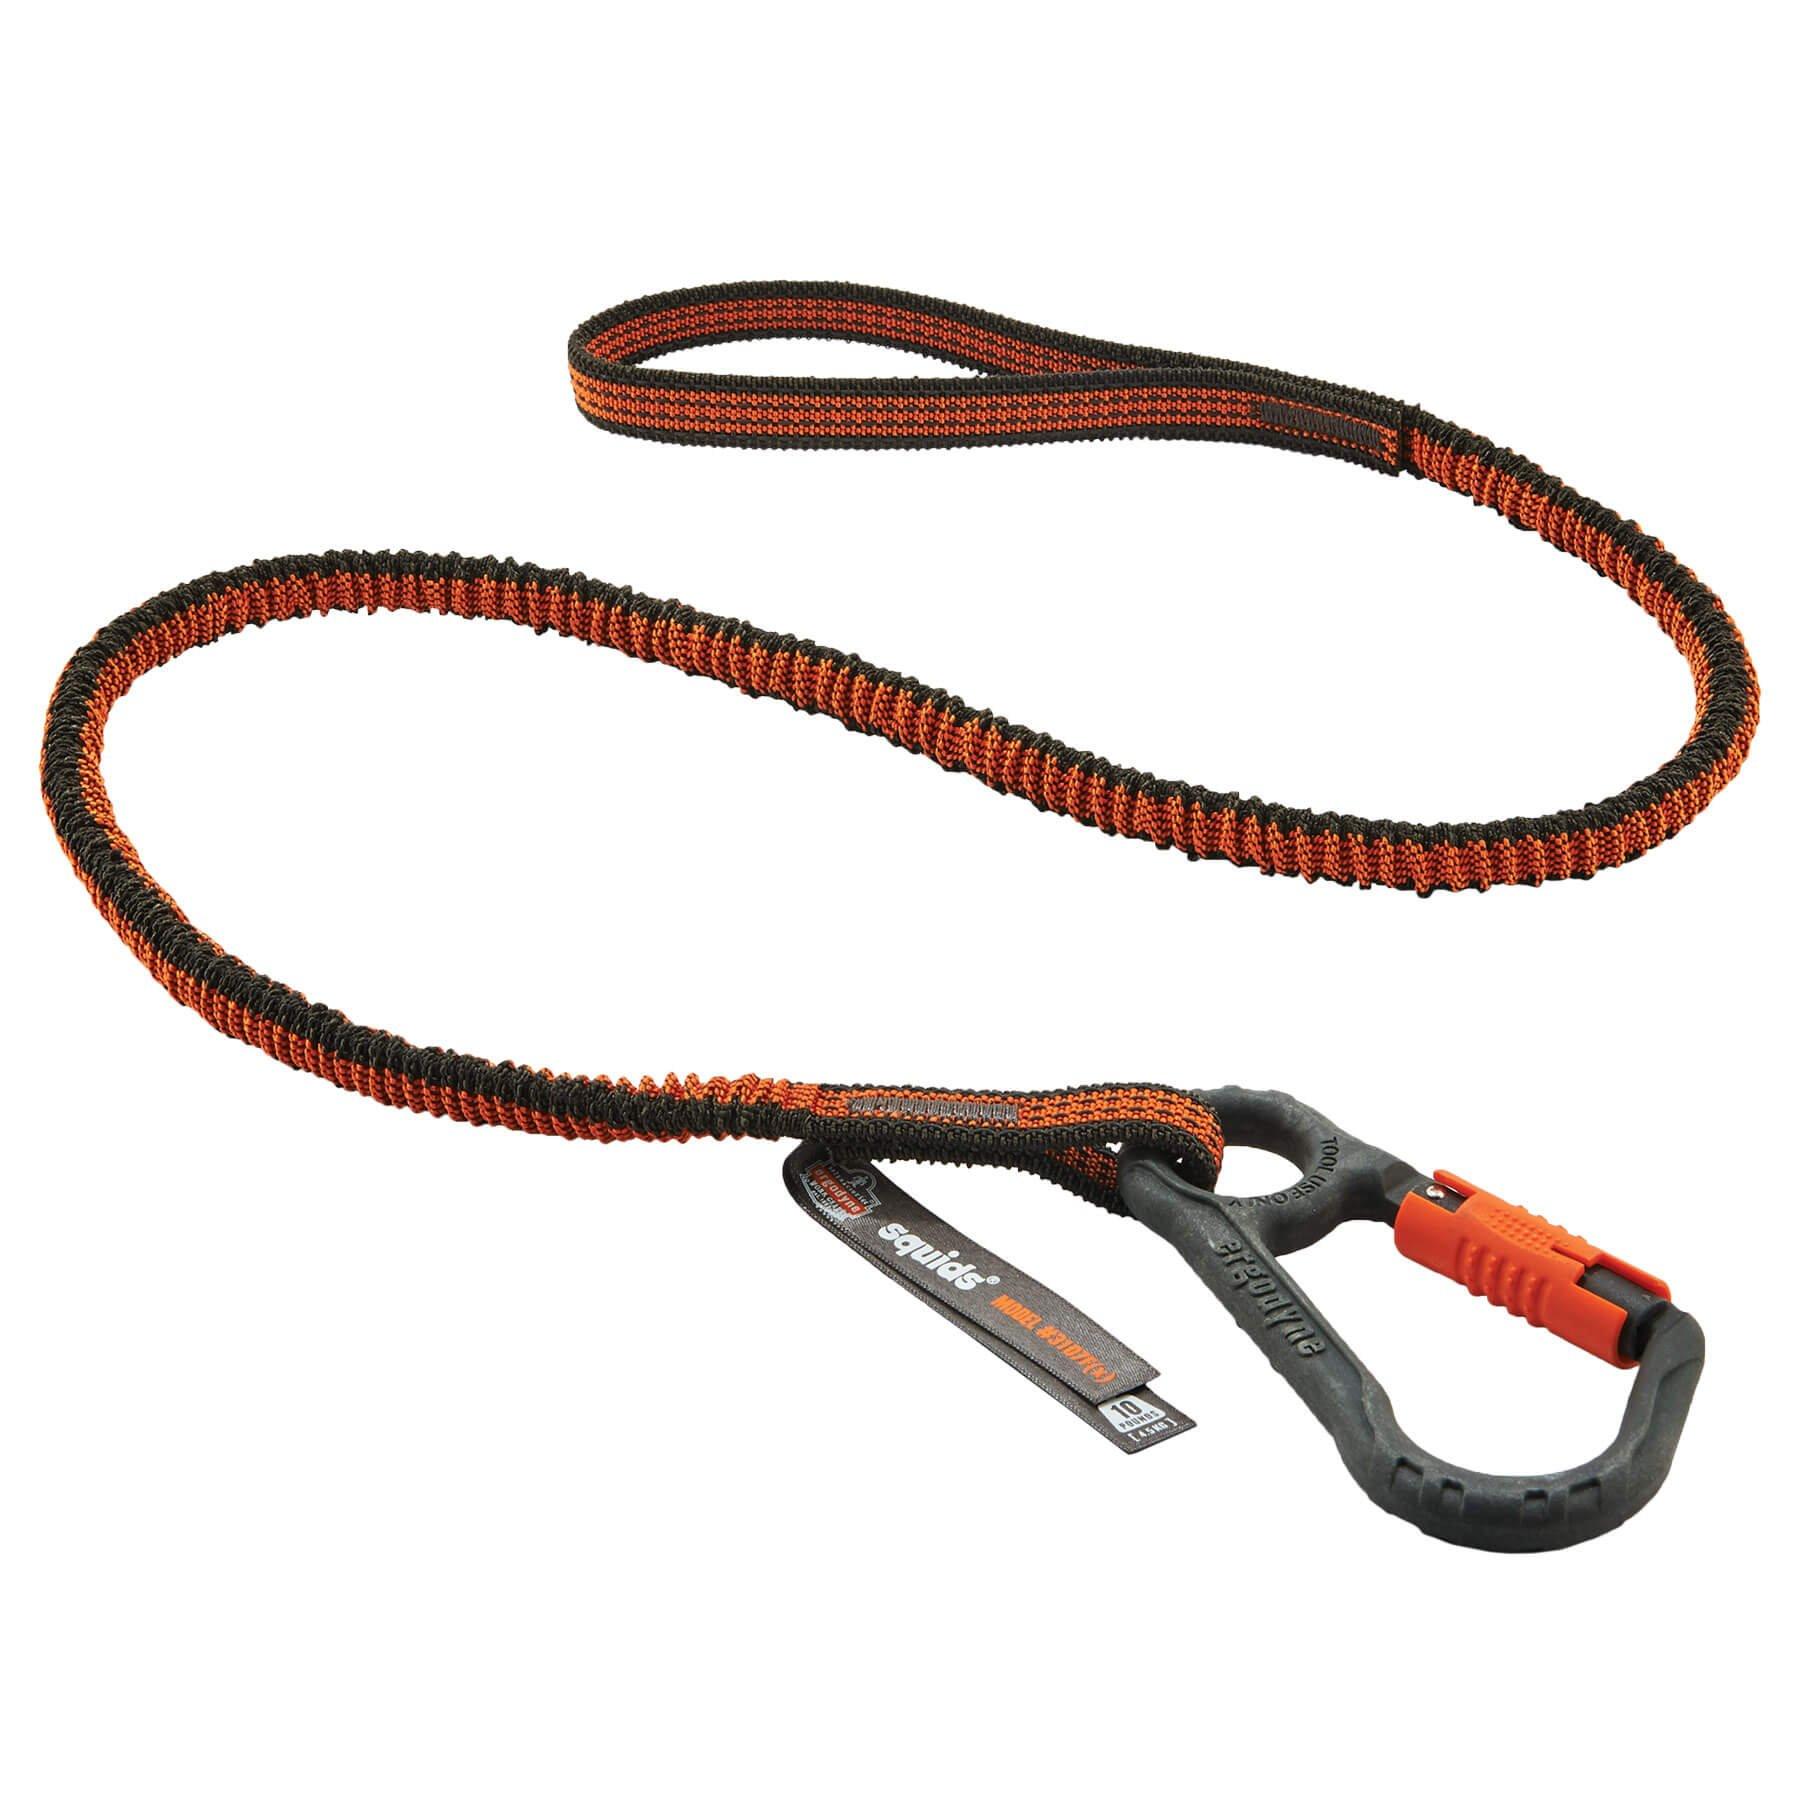 Ergodyne Squids 3107F(x) Shock Absorbing Tool Lanyard with Nylon Composite Locking Carabiner, 10 Pounds